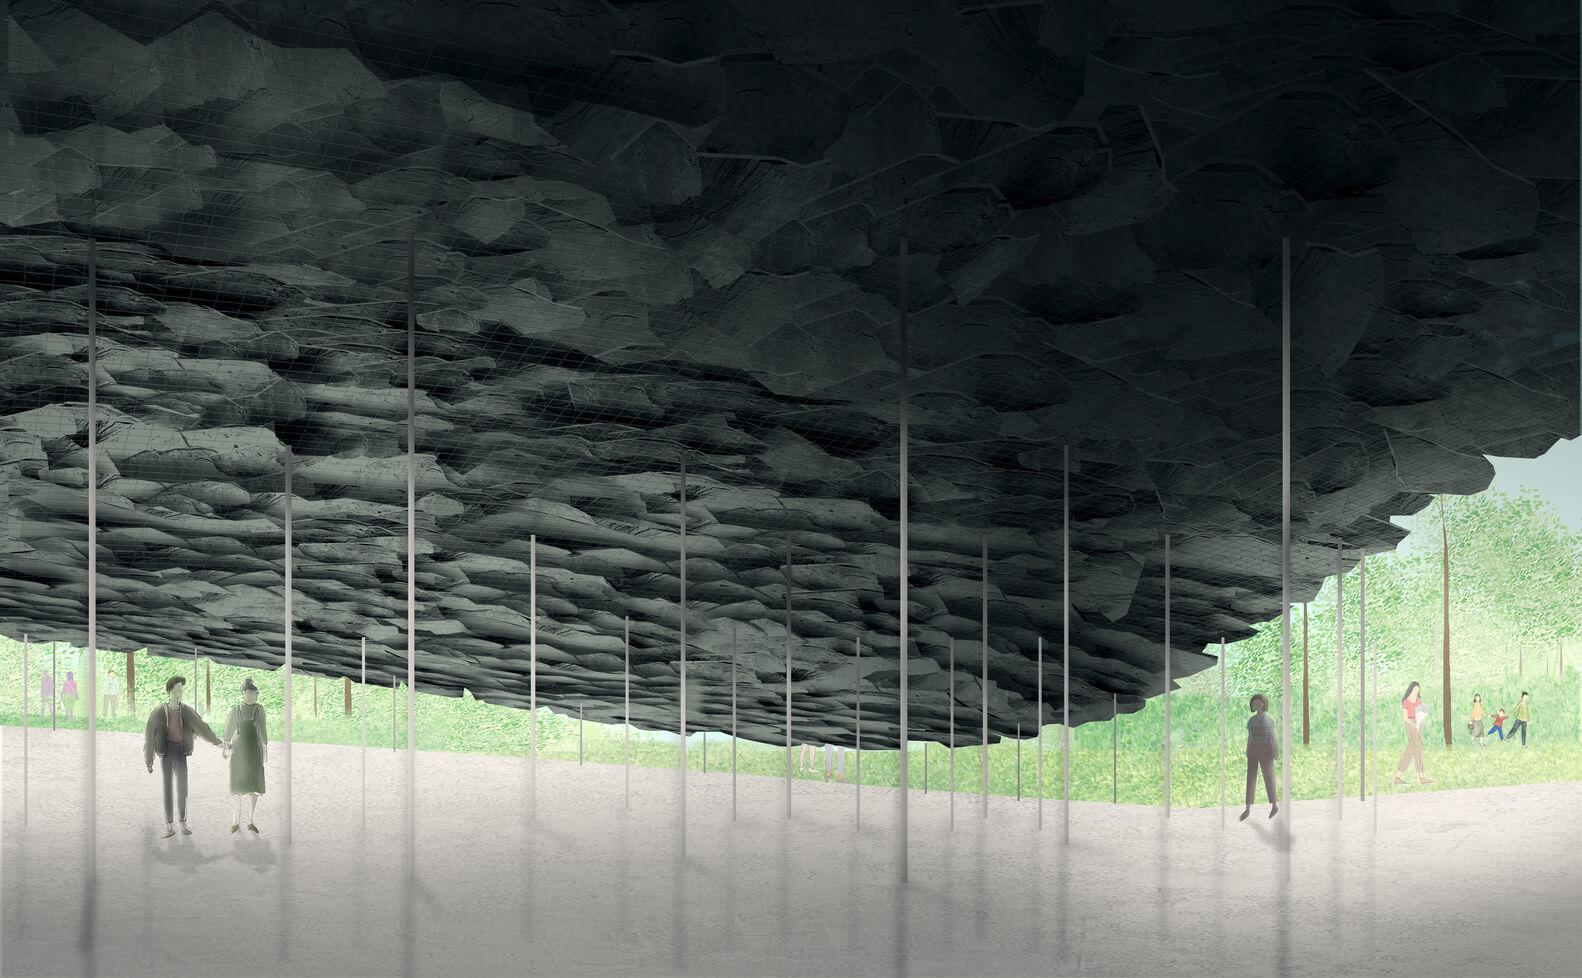 Serpentine Pavilion 2019 será projetado pelo arquiteto japonês Junya Ishigami